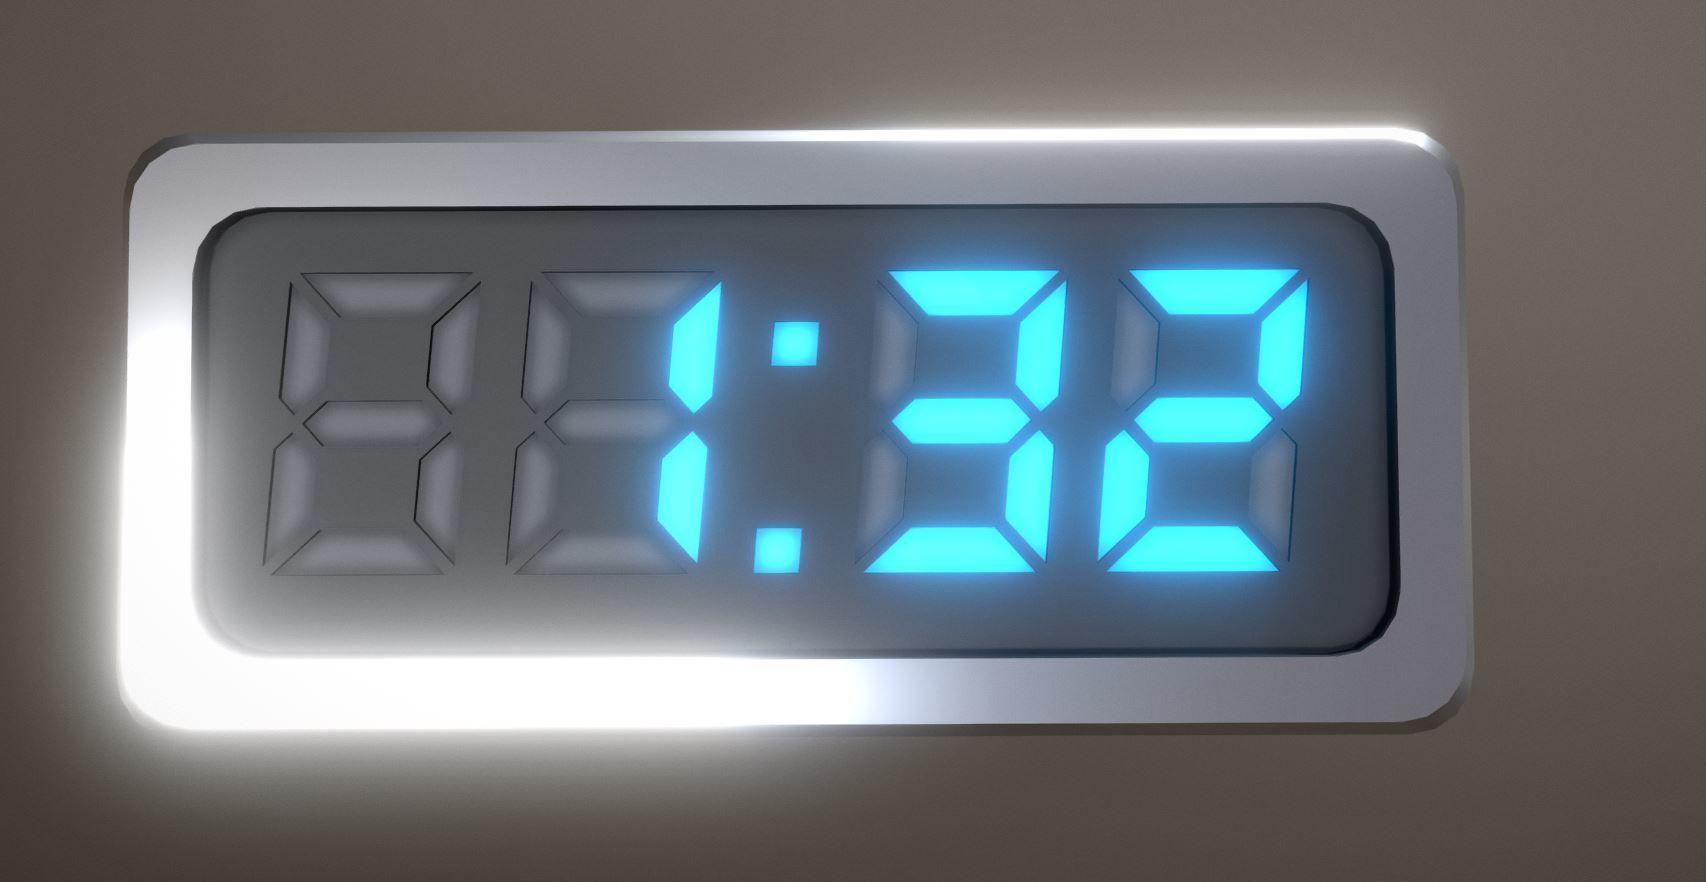 5-4-3-2-1-Video-Countdown-Simple-Version